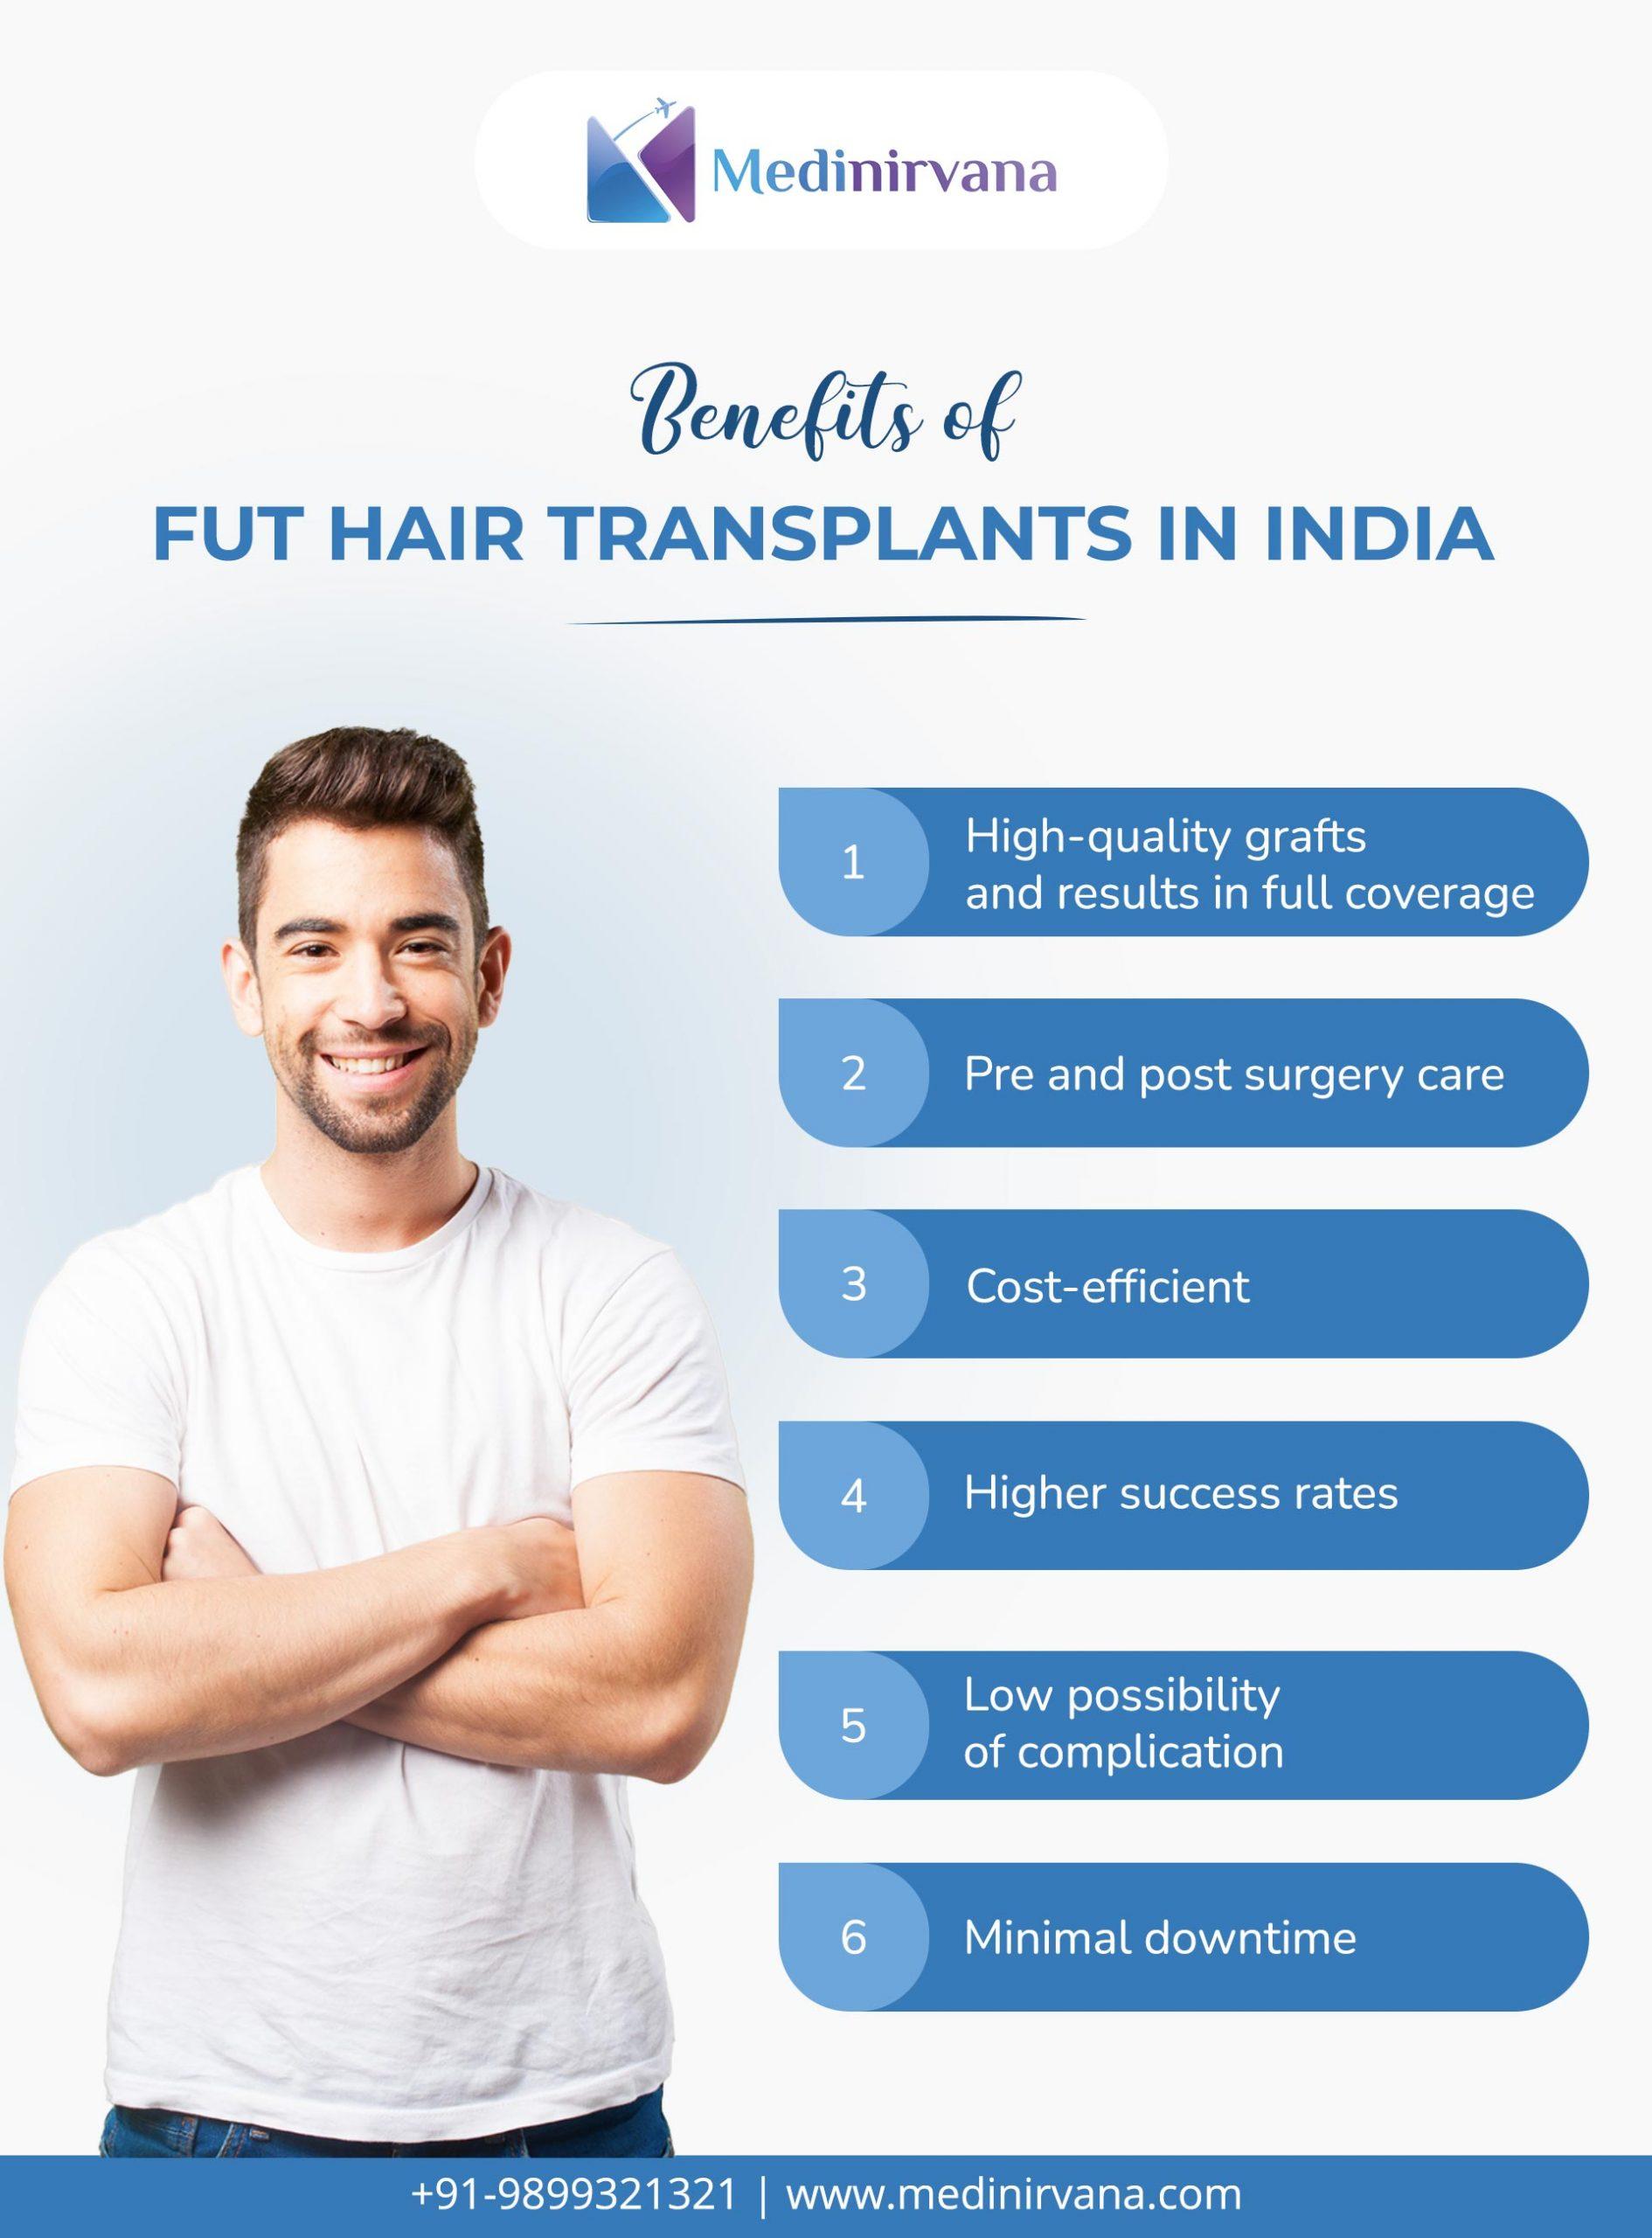 Benefits of FUT Hair Transplant